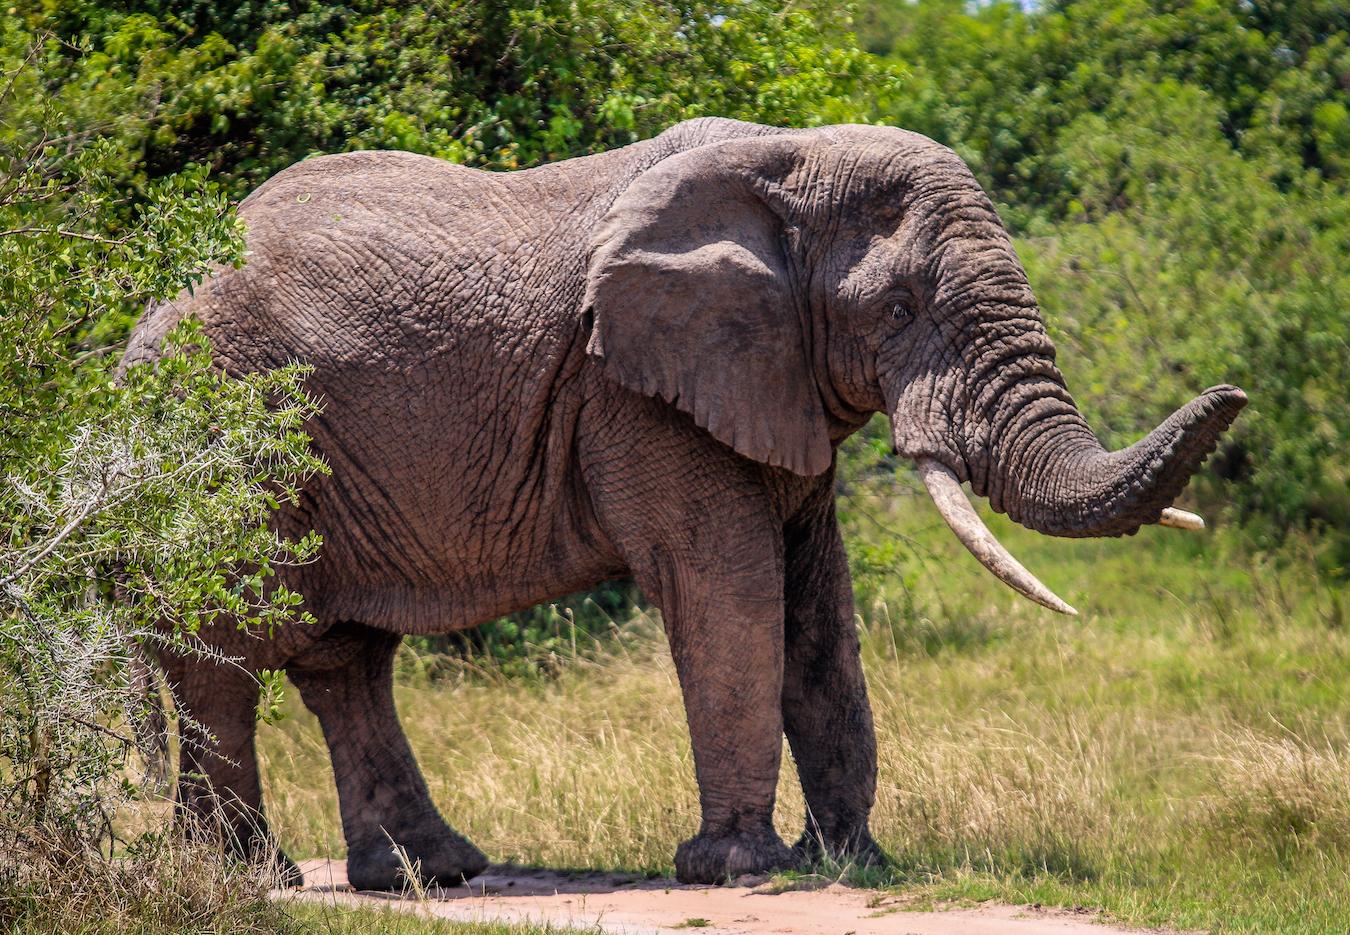 Elephant in Akagera National Park, Rwanda